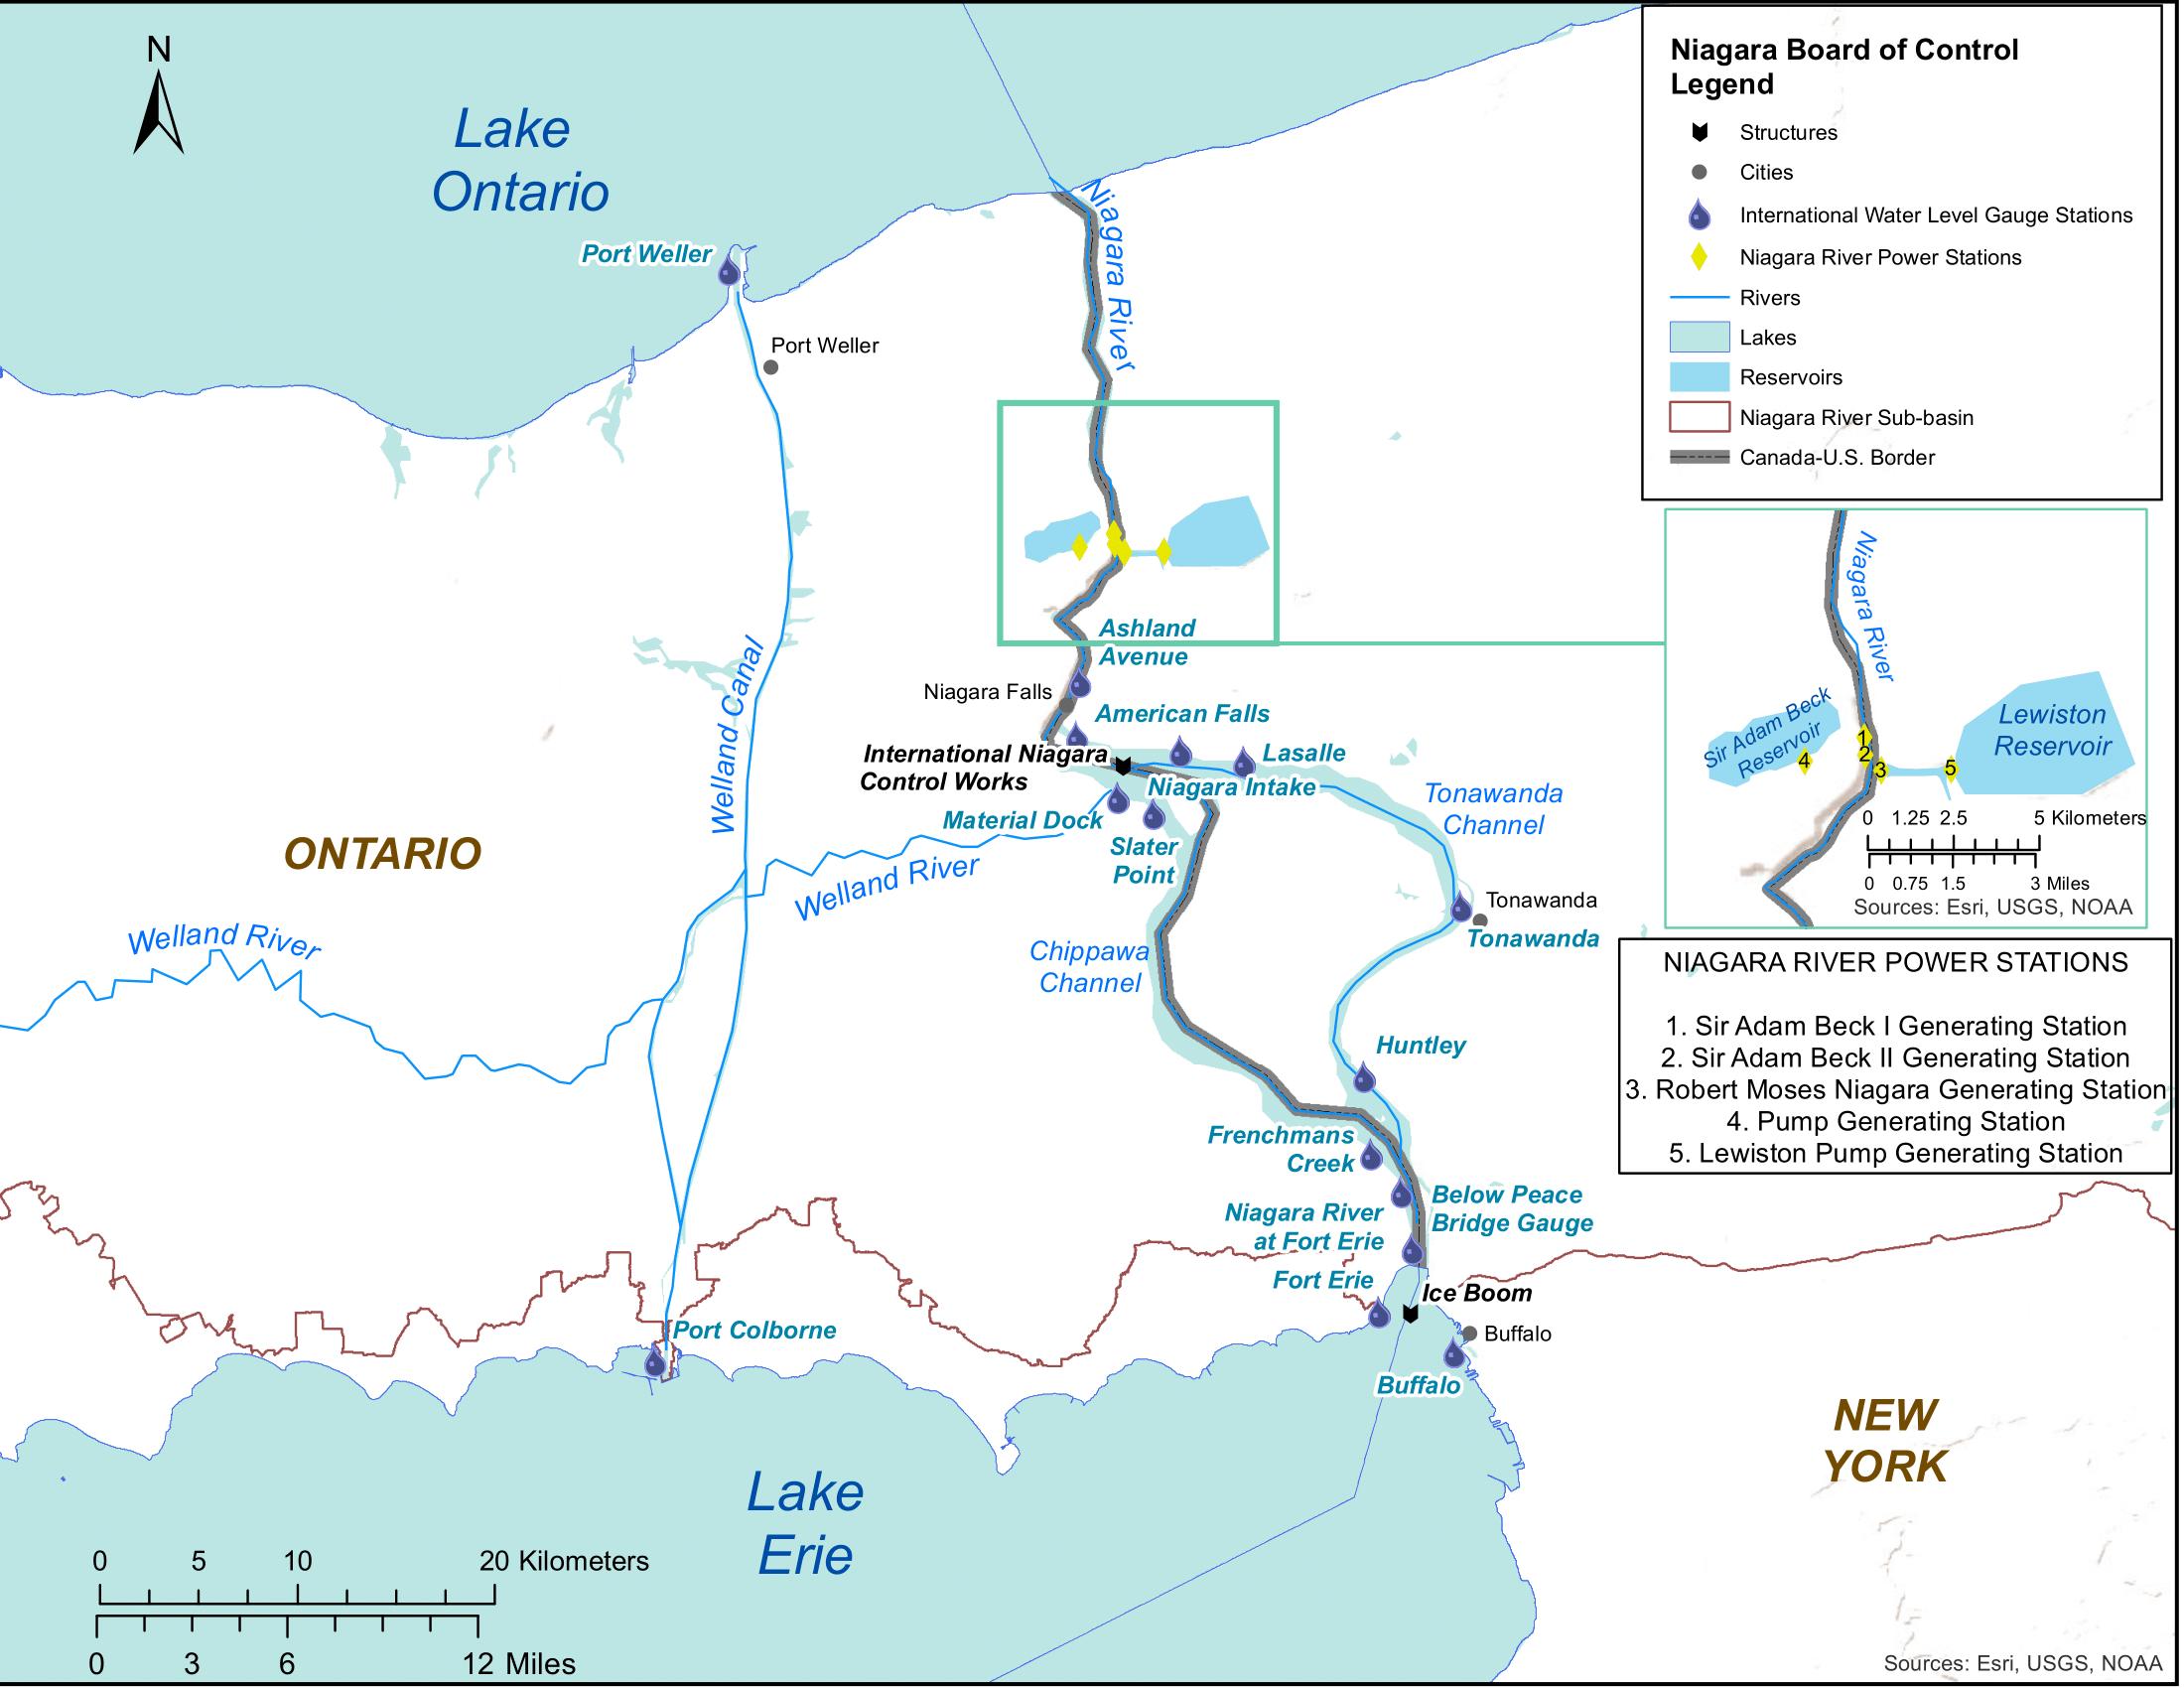 INBC - Niagara River sub-basin map